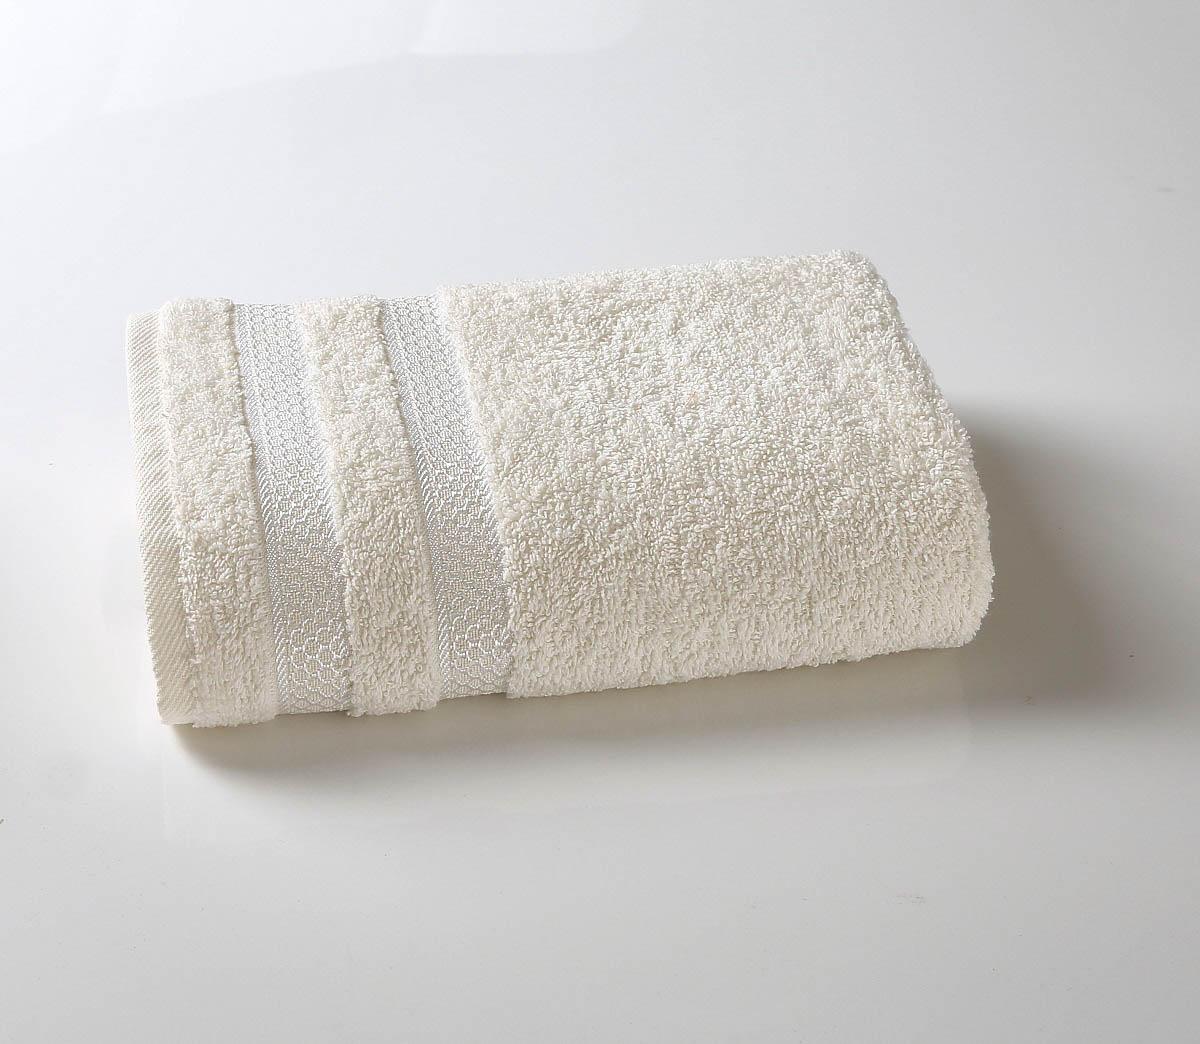 Полотенца Karna Полотенце Petek Цвет: Кремовый (70х140 см) полотенца karna полотенце iteka цвет коричневый 70х140 см